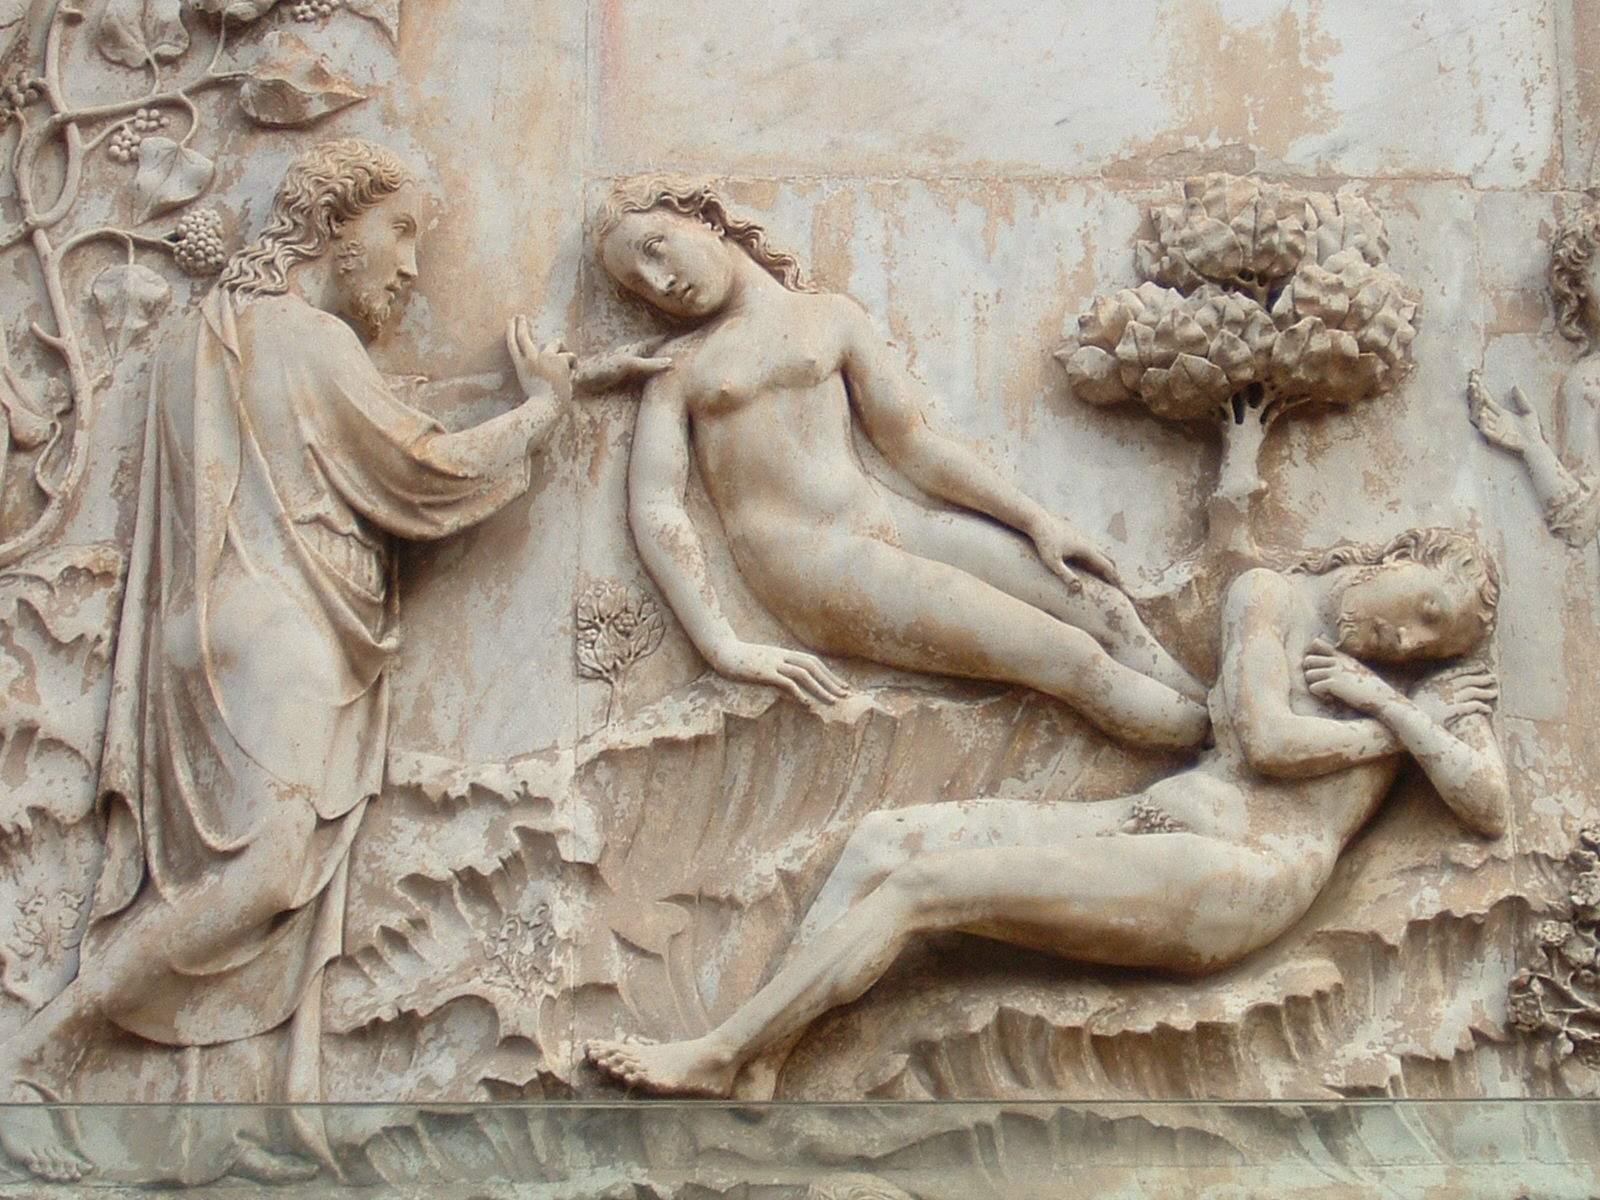 Dettaglio duomo Orvieto2